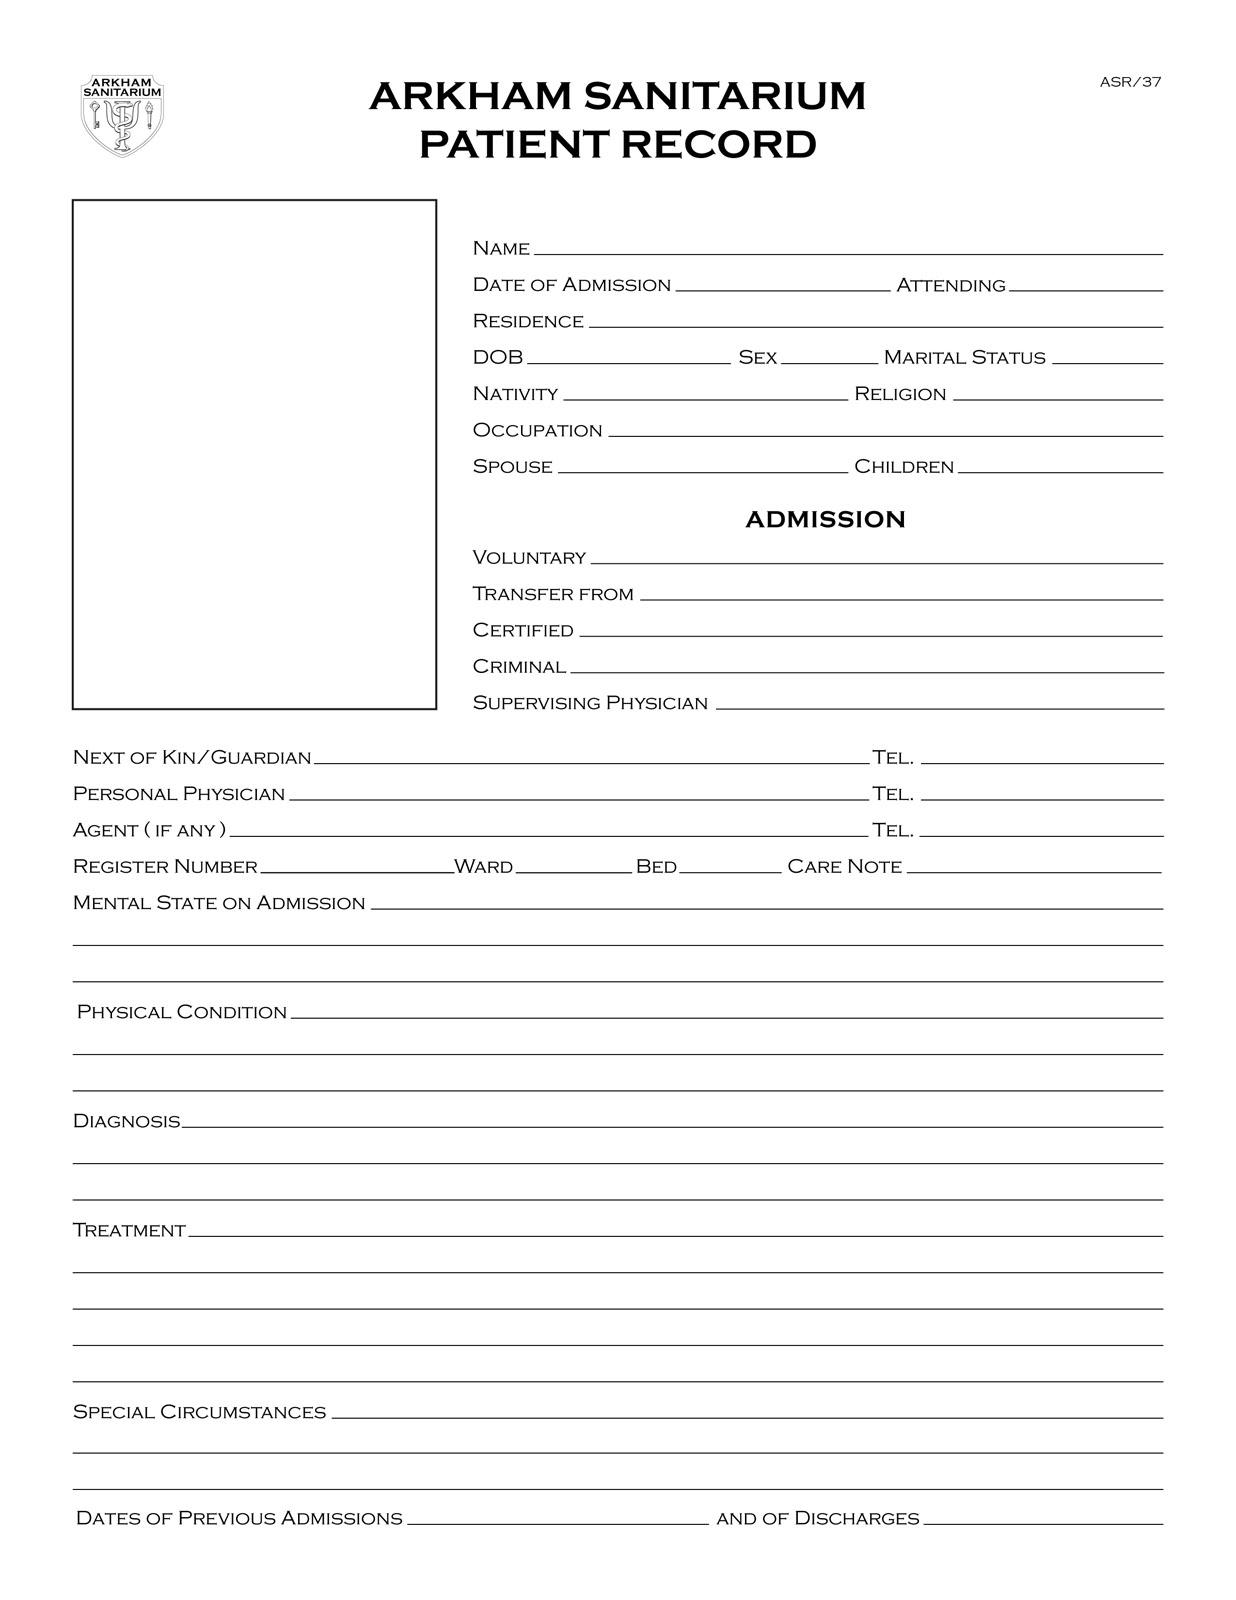 Medical Records Release Form Lawdepot Propnomicon Arkham Sanitarium Patient Record